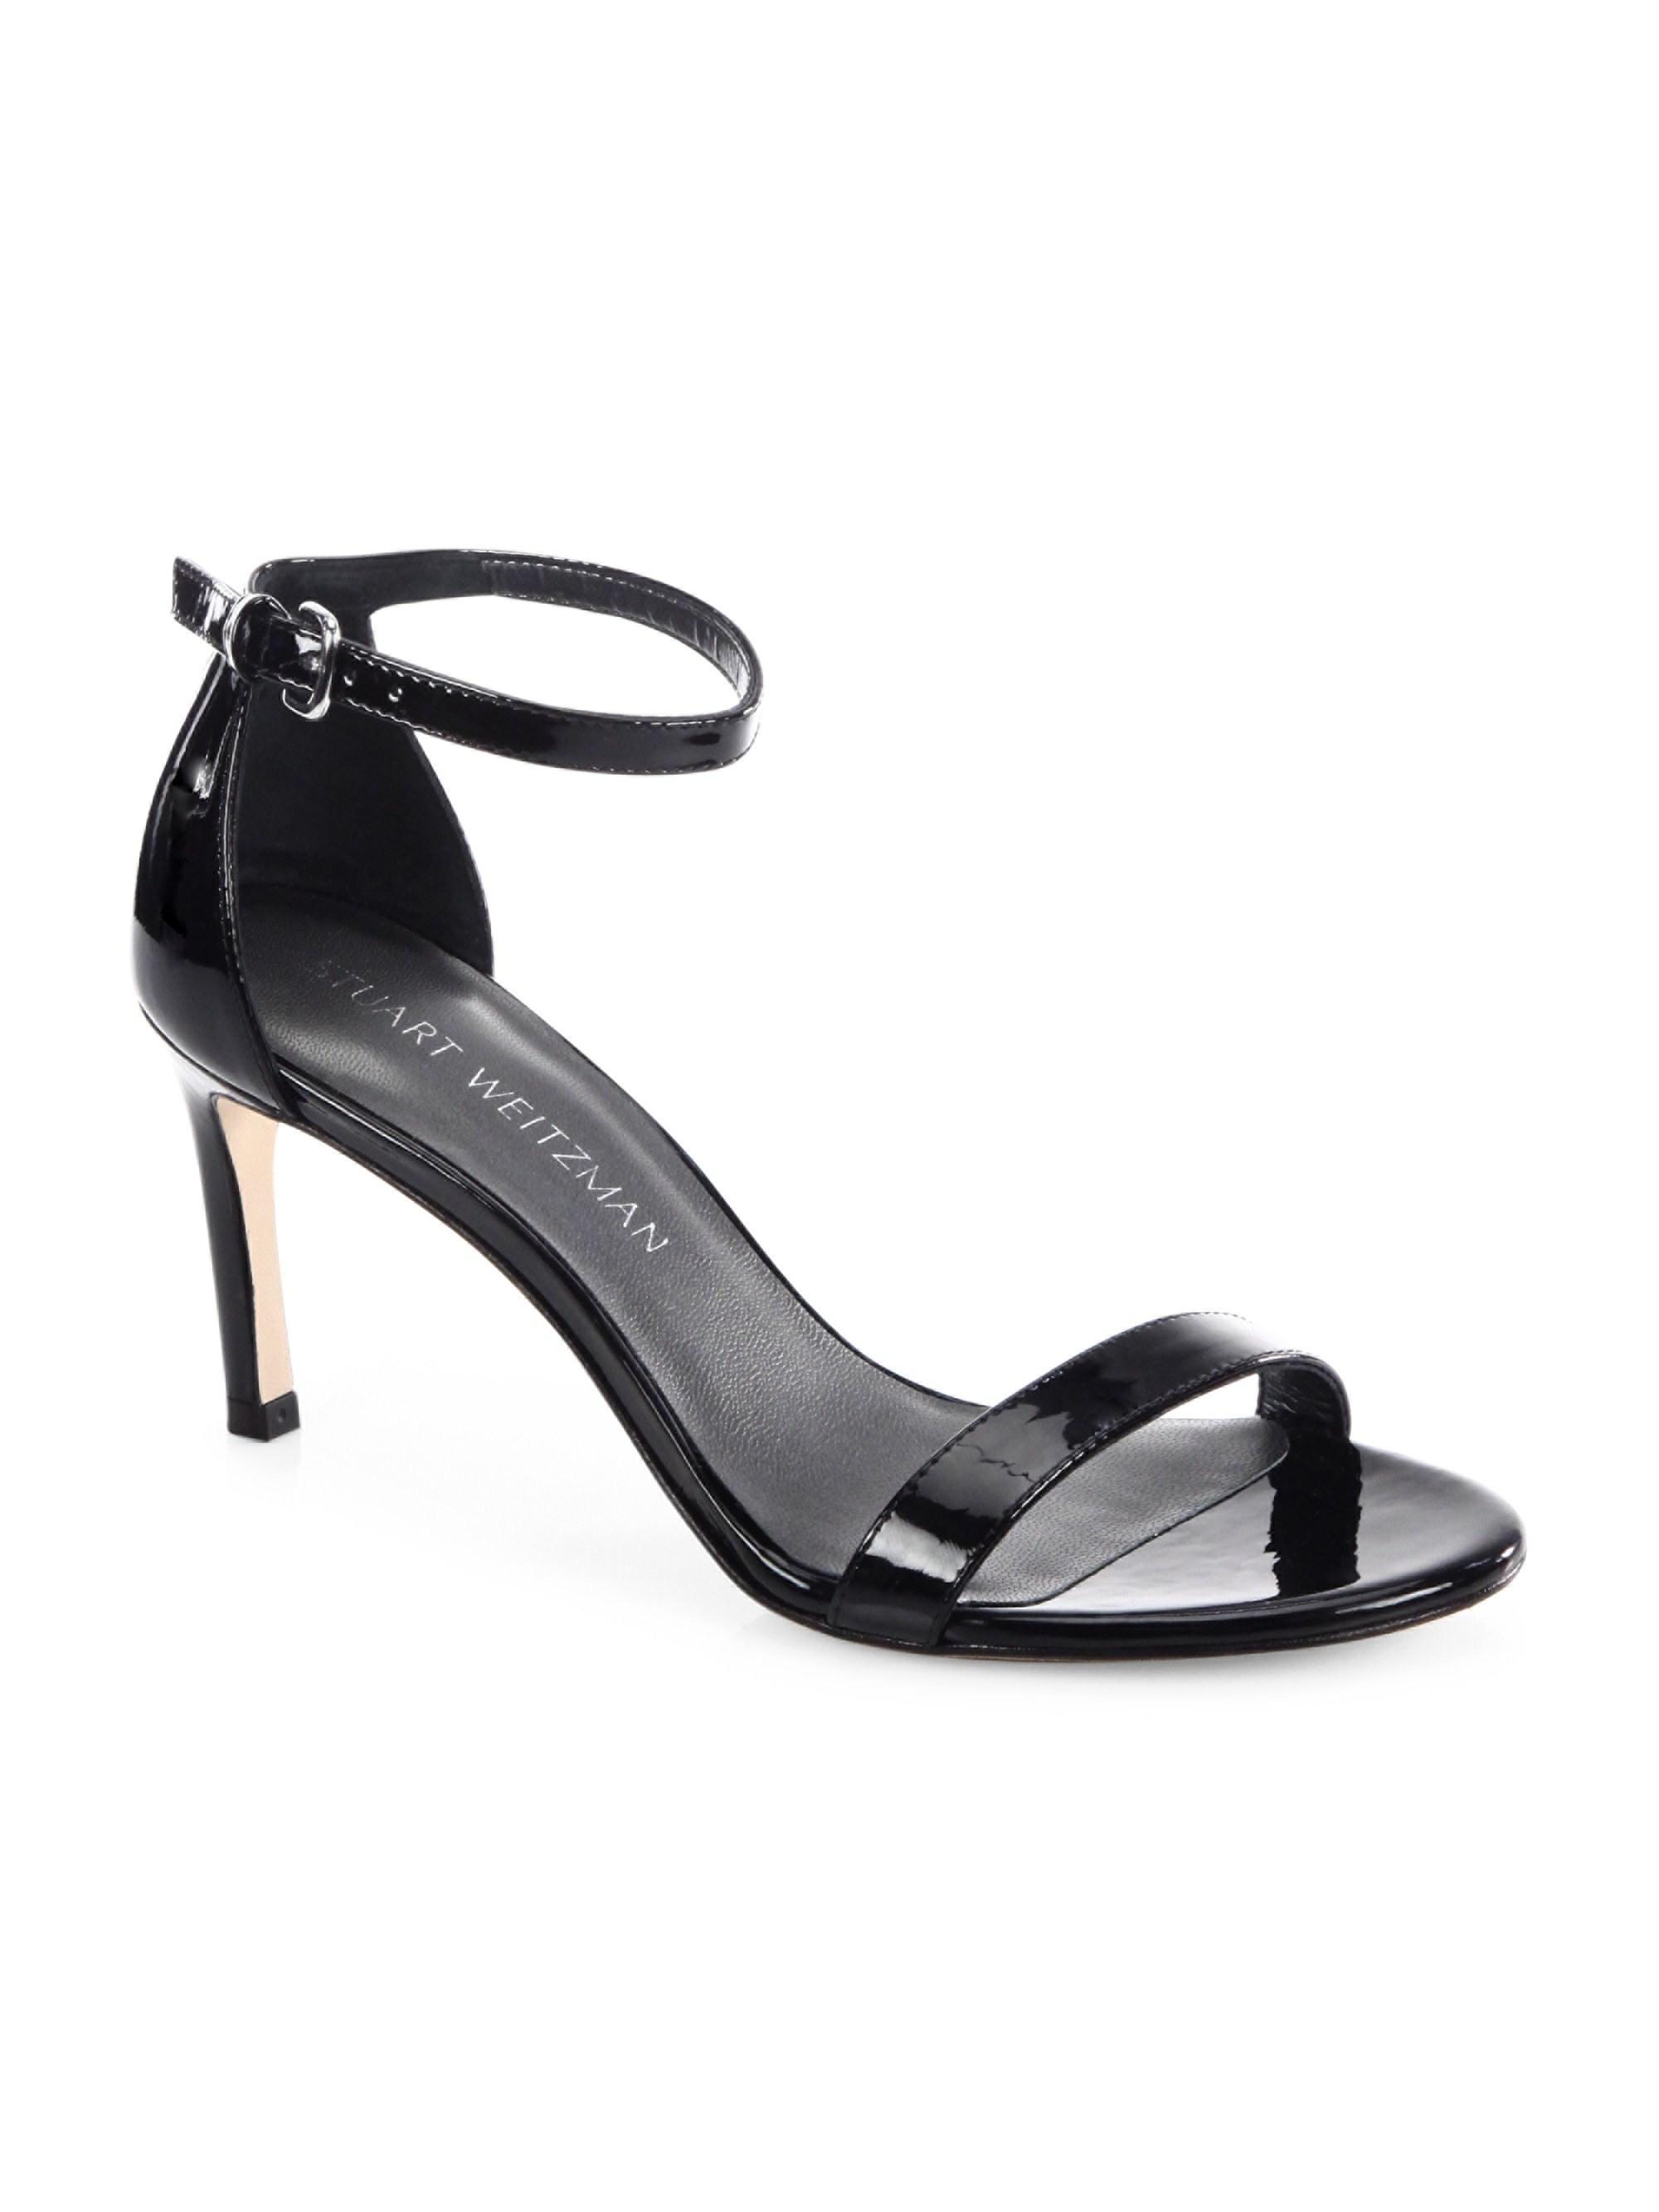 4cf21c810075 Lyst - Stuart Weitzman Nunakedstraight Patent Leather Ankle-strap ...